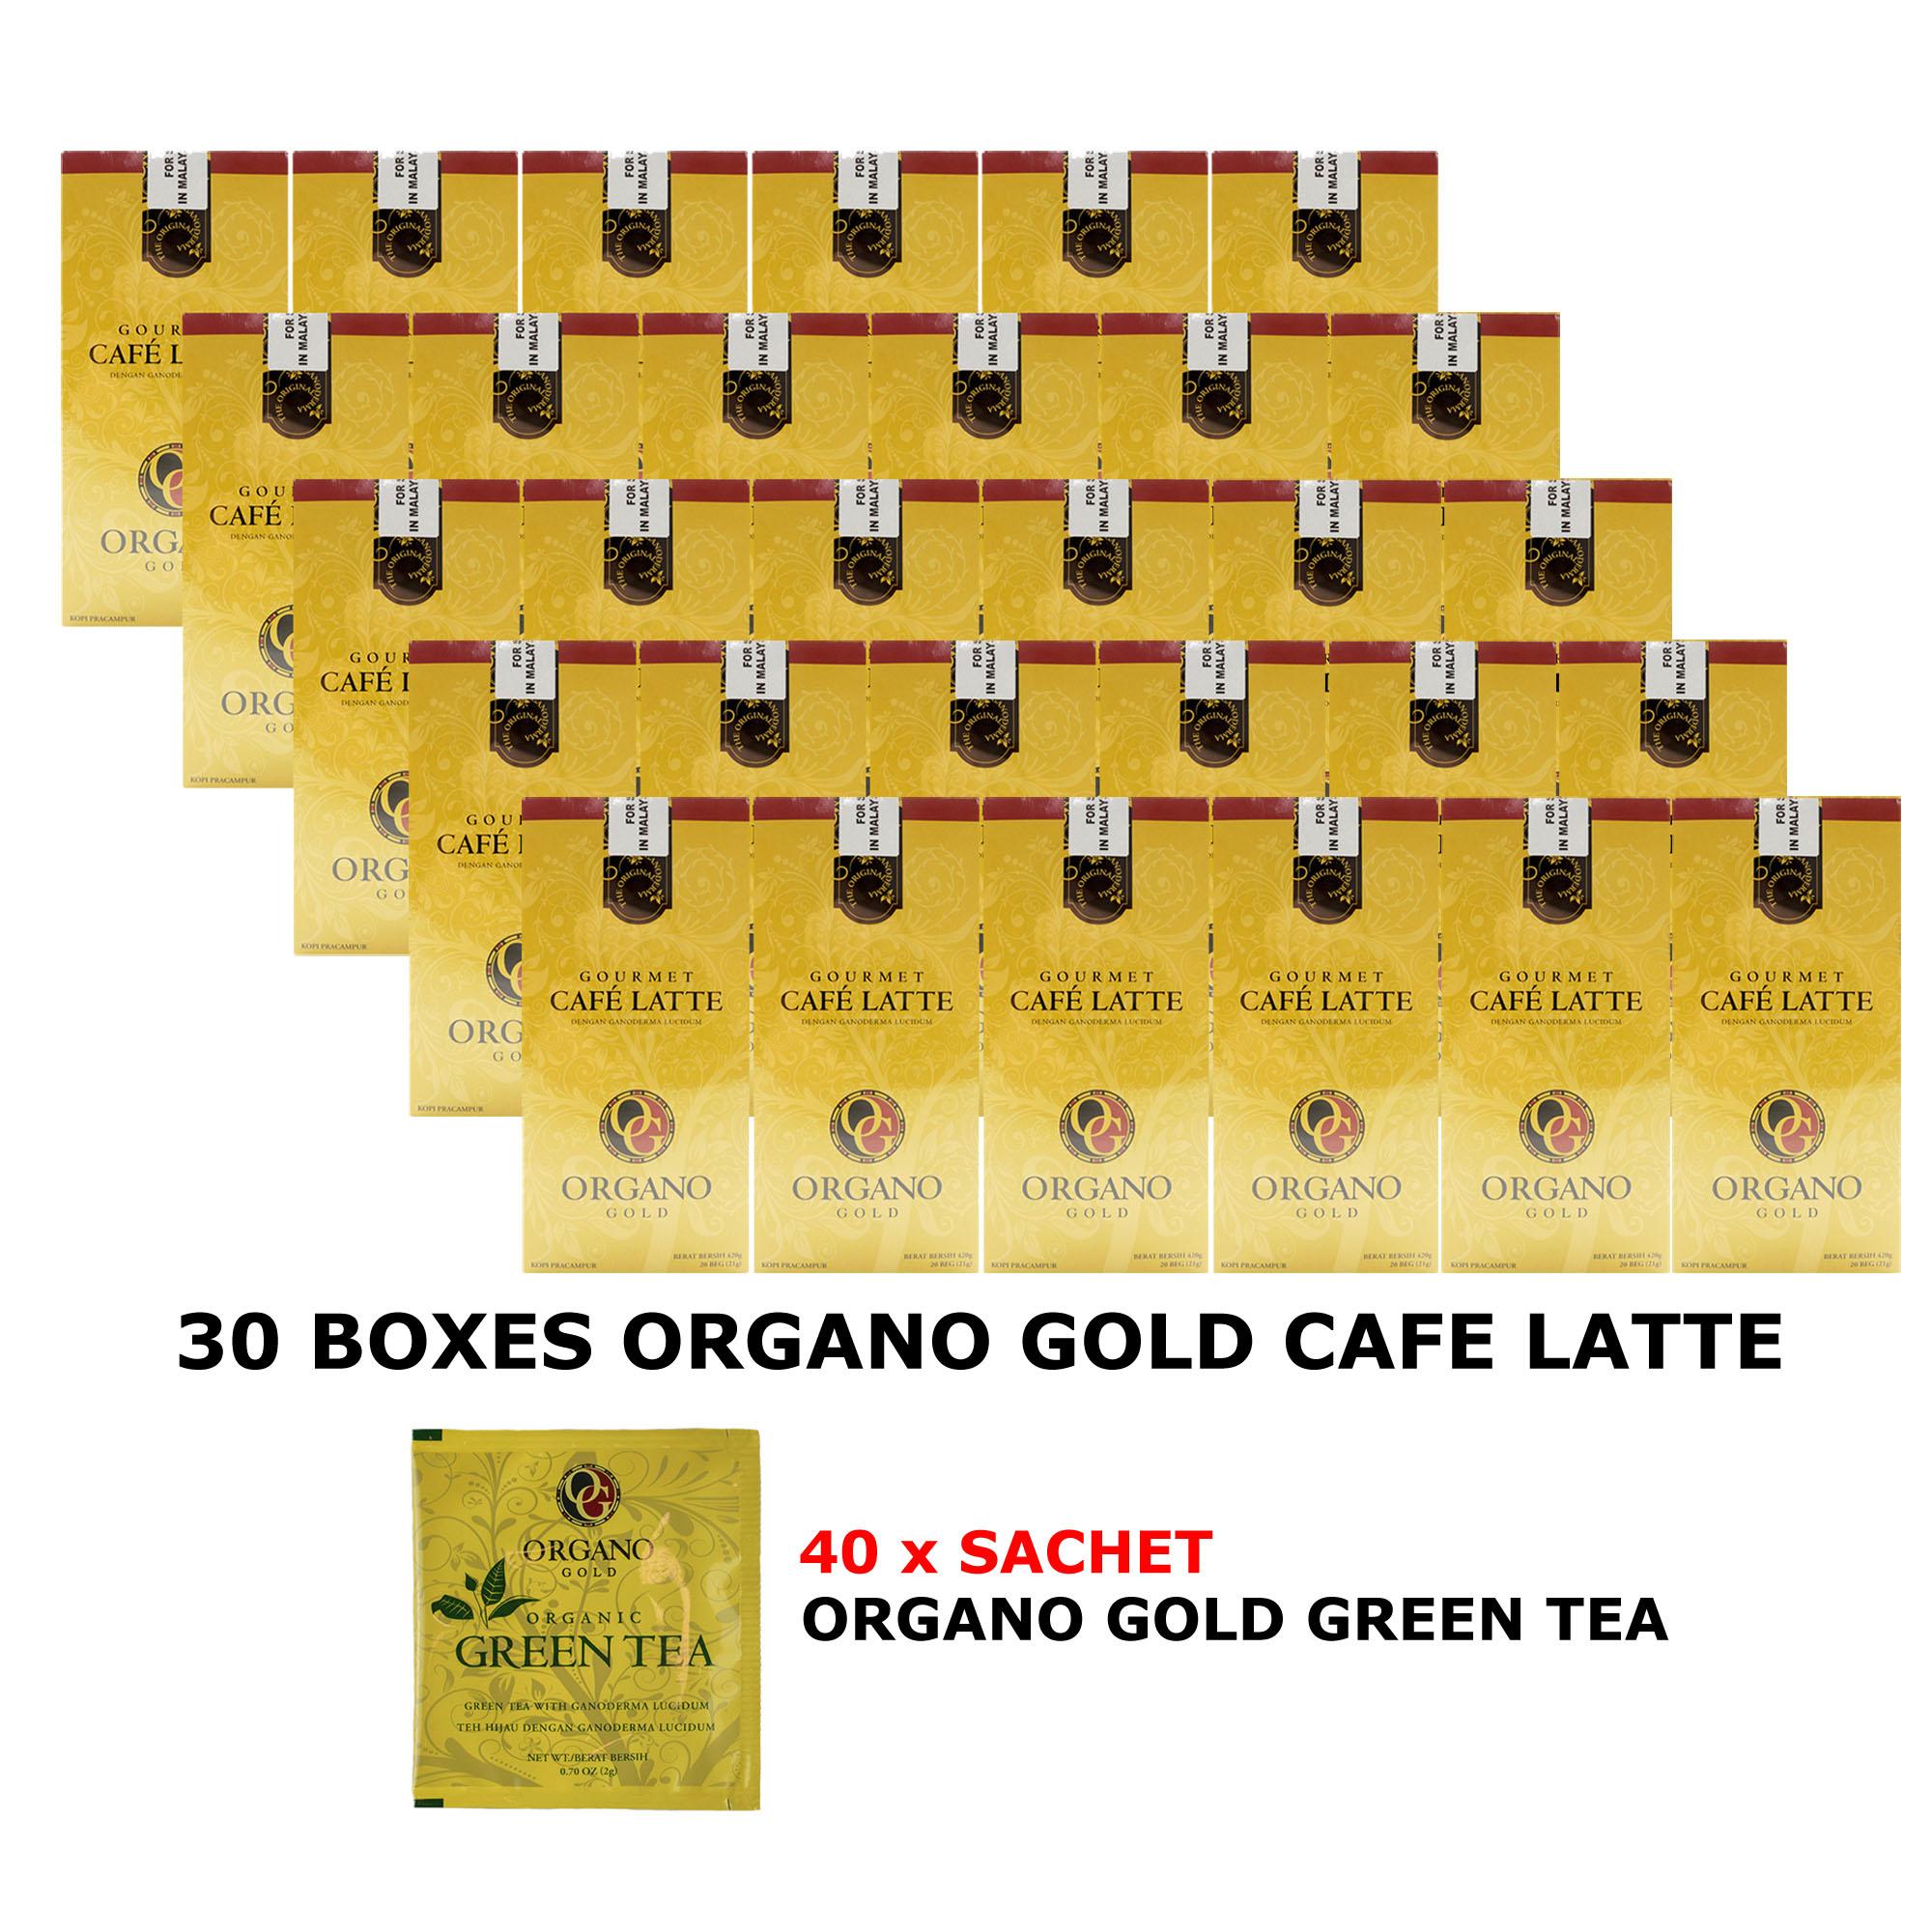 30 box Organo Gold Cafe Latte